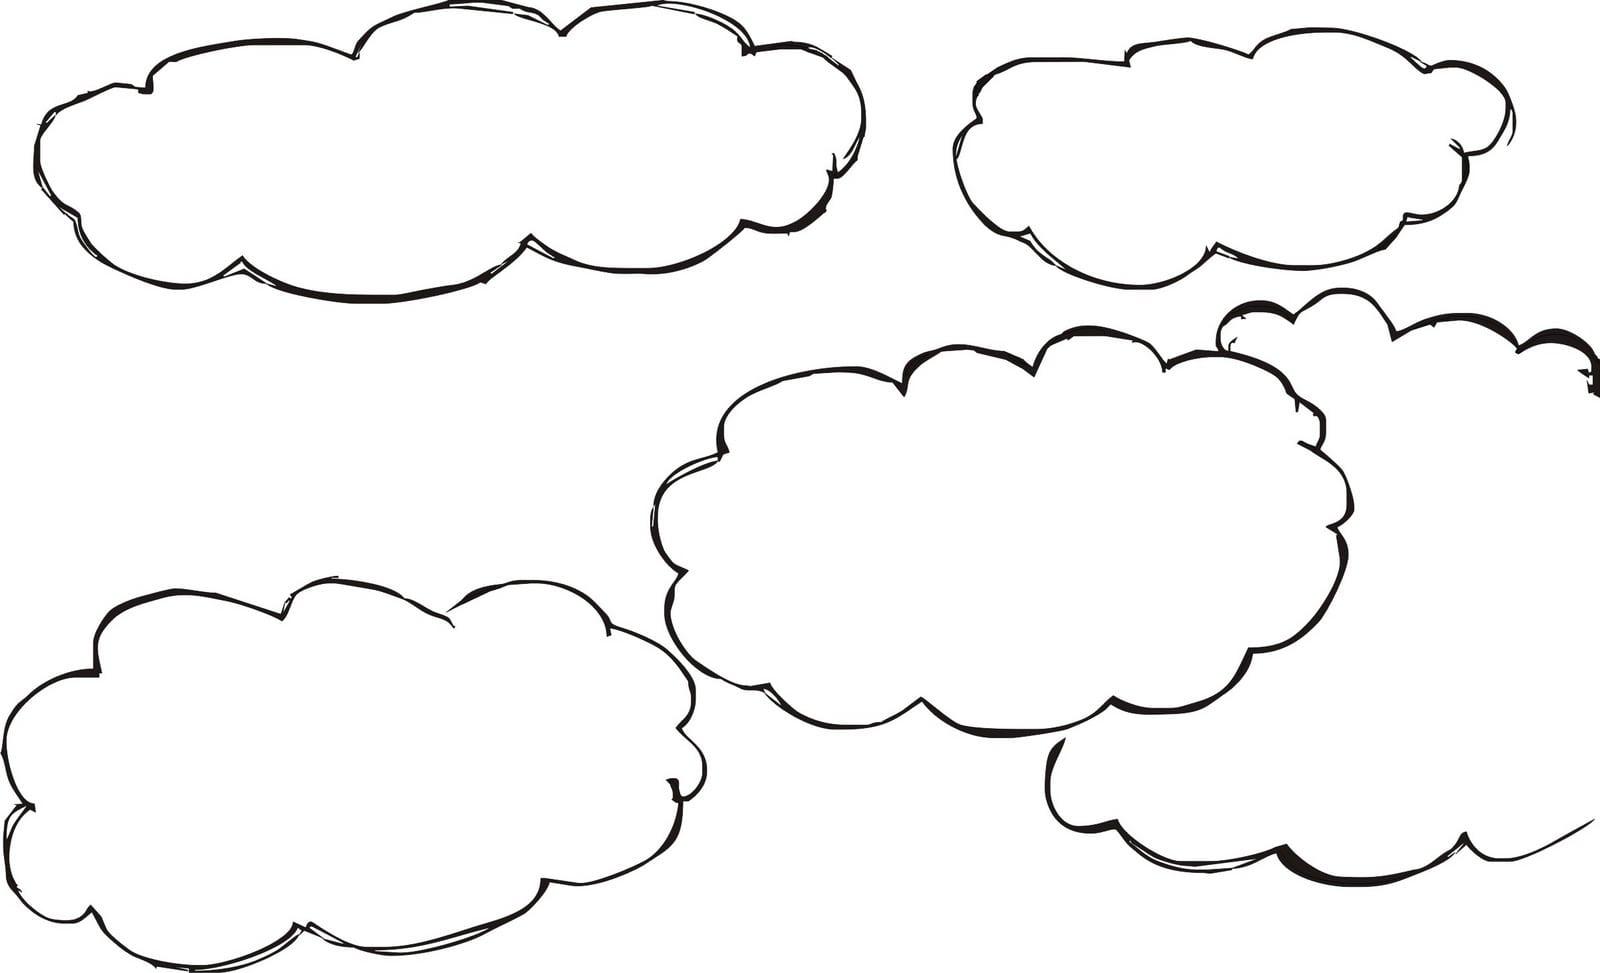 Nuvem Desenho Related Keywords & Suggestions